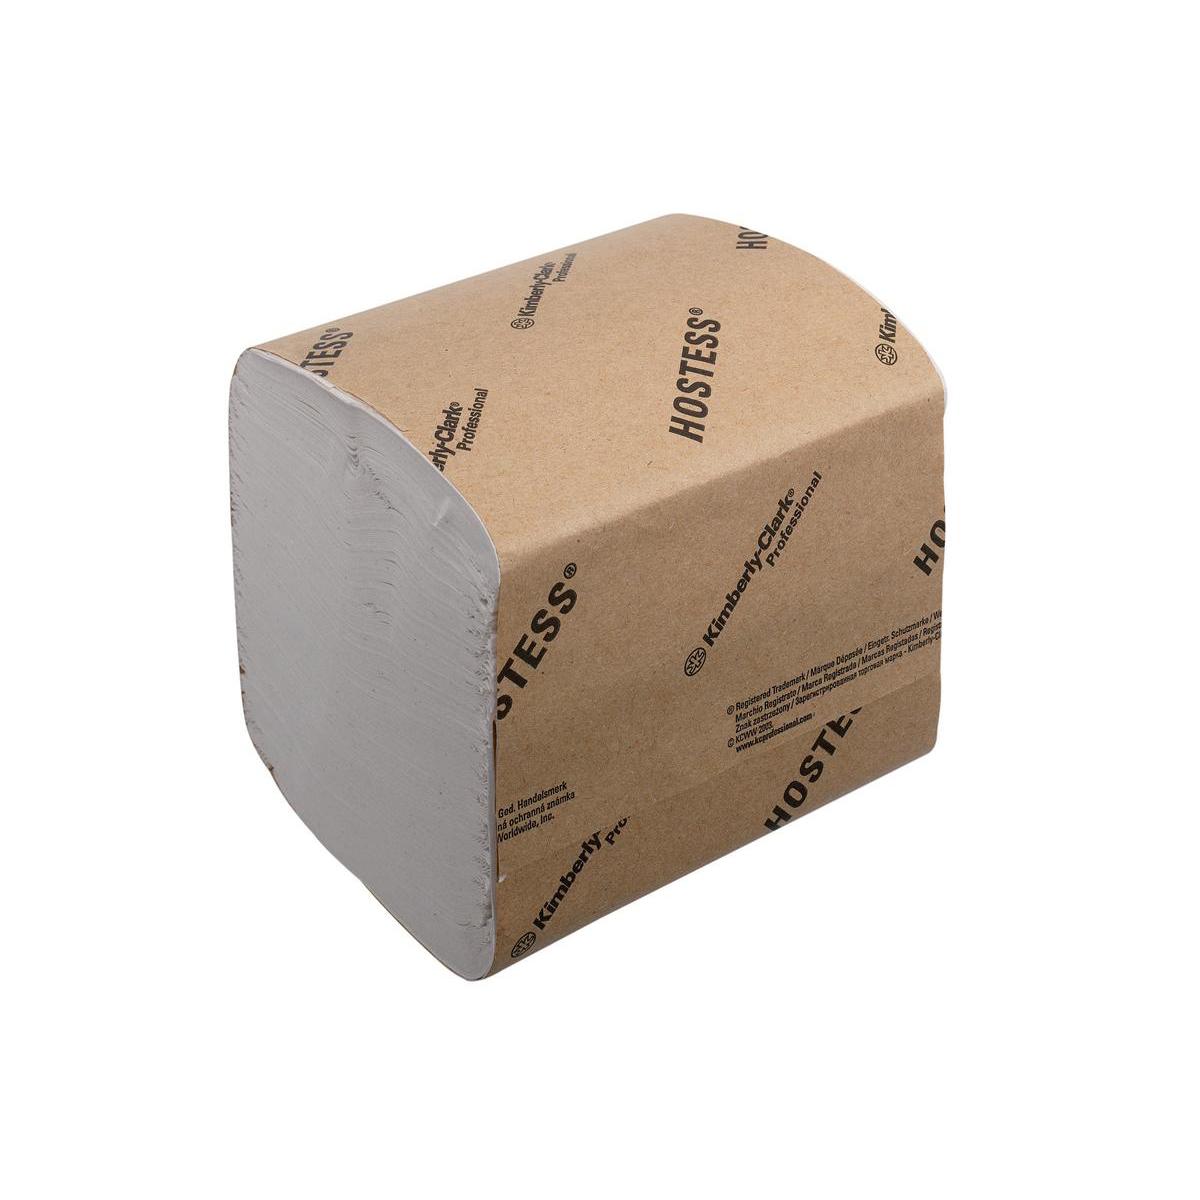 Hostess Toilet Tissue Bulk Recycled Biodegradable Sheet 186x114mm 520 Sheets Ref 4471 [36 Sleeves]